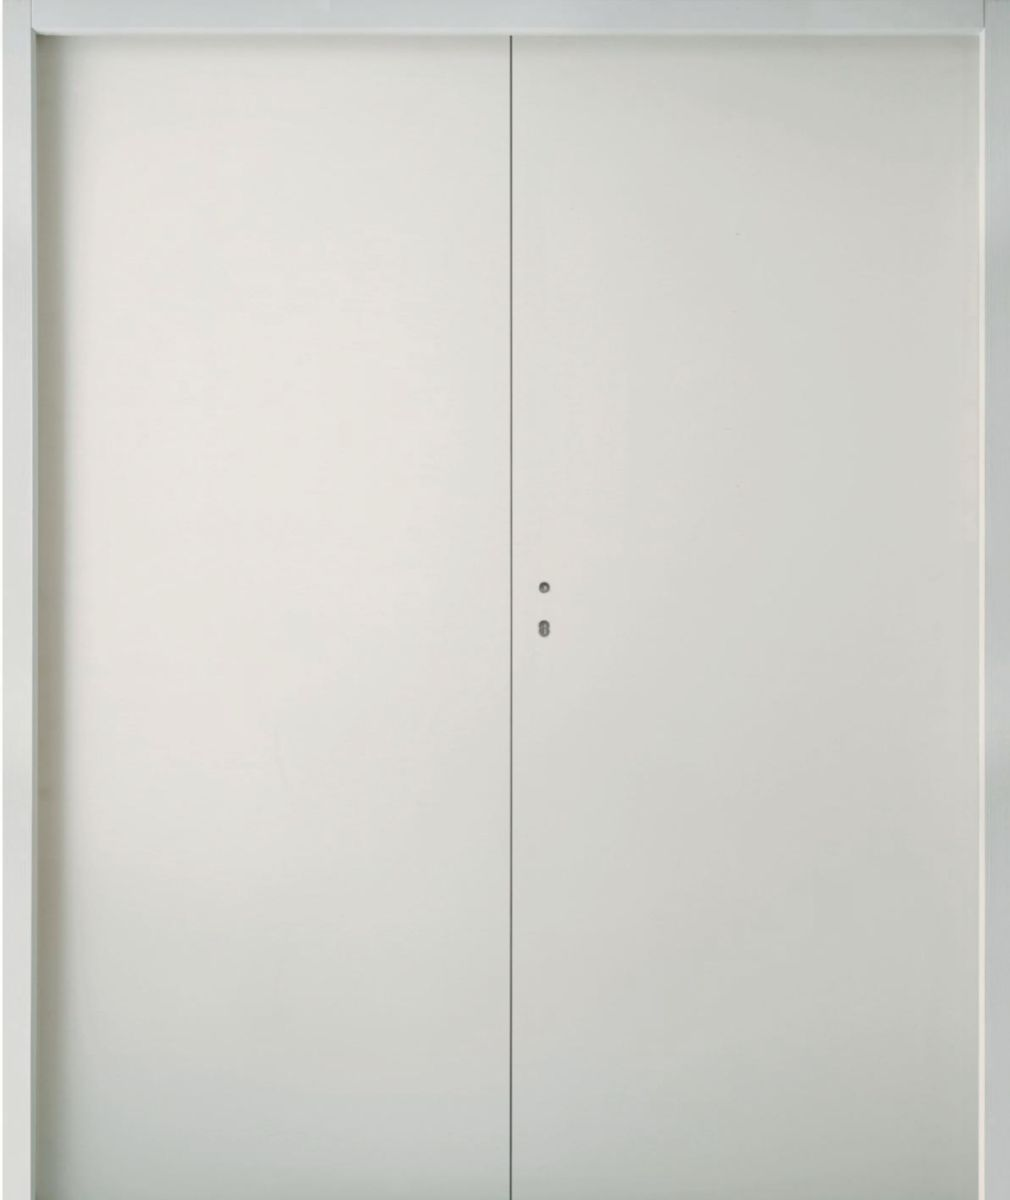 Bloc porte coupe feu 30 min ei30 huisserie perf 72 mm blanc jeld